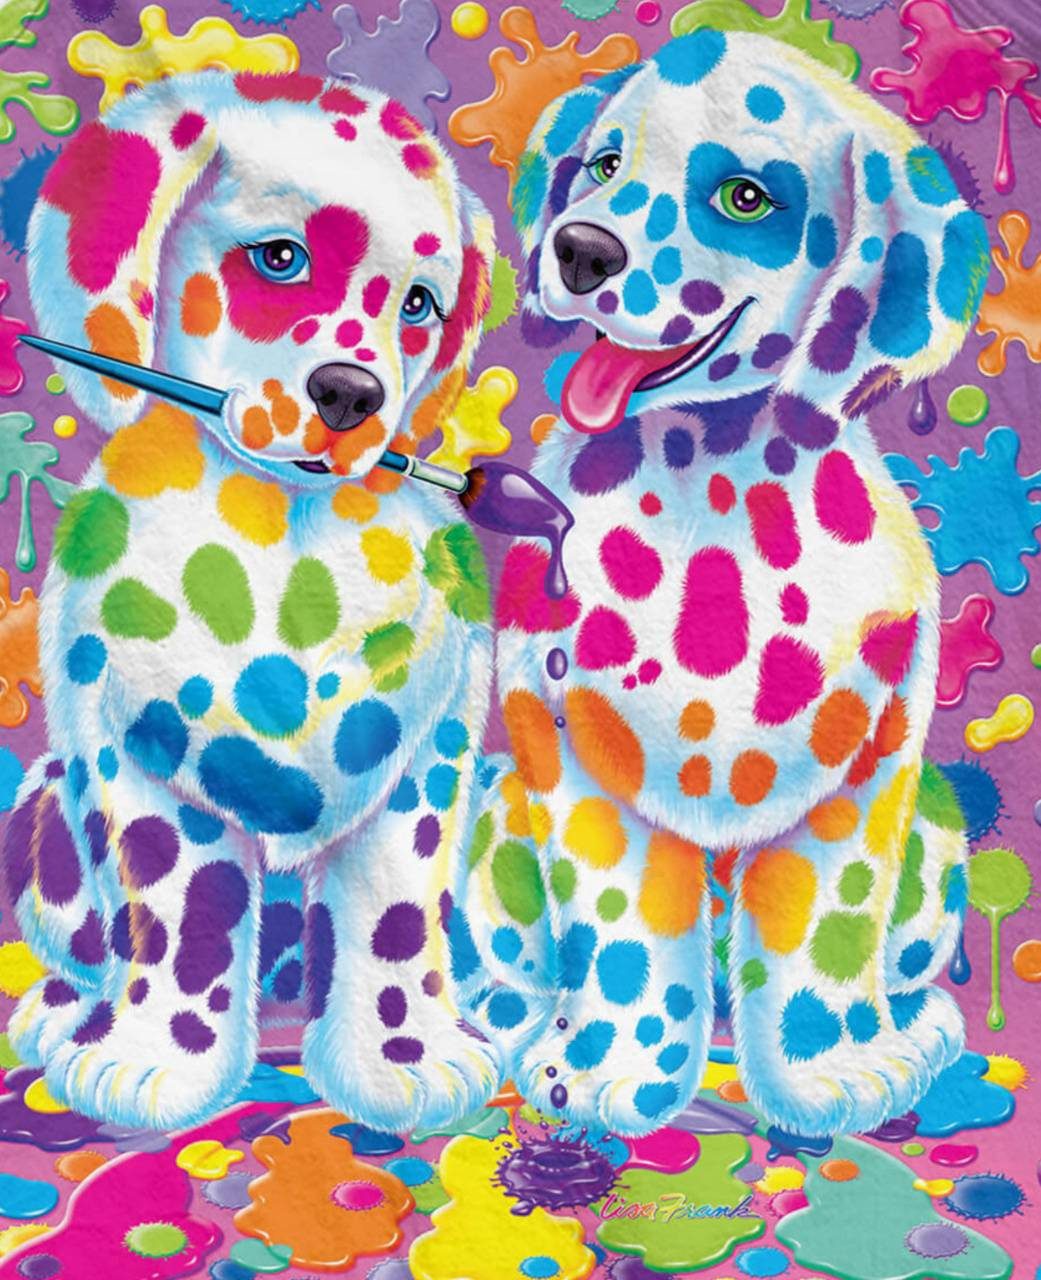 Rainbow Dog Wallpapers - Top Free ...